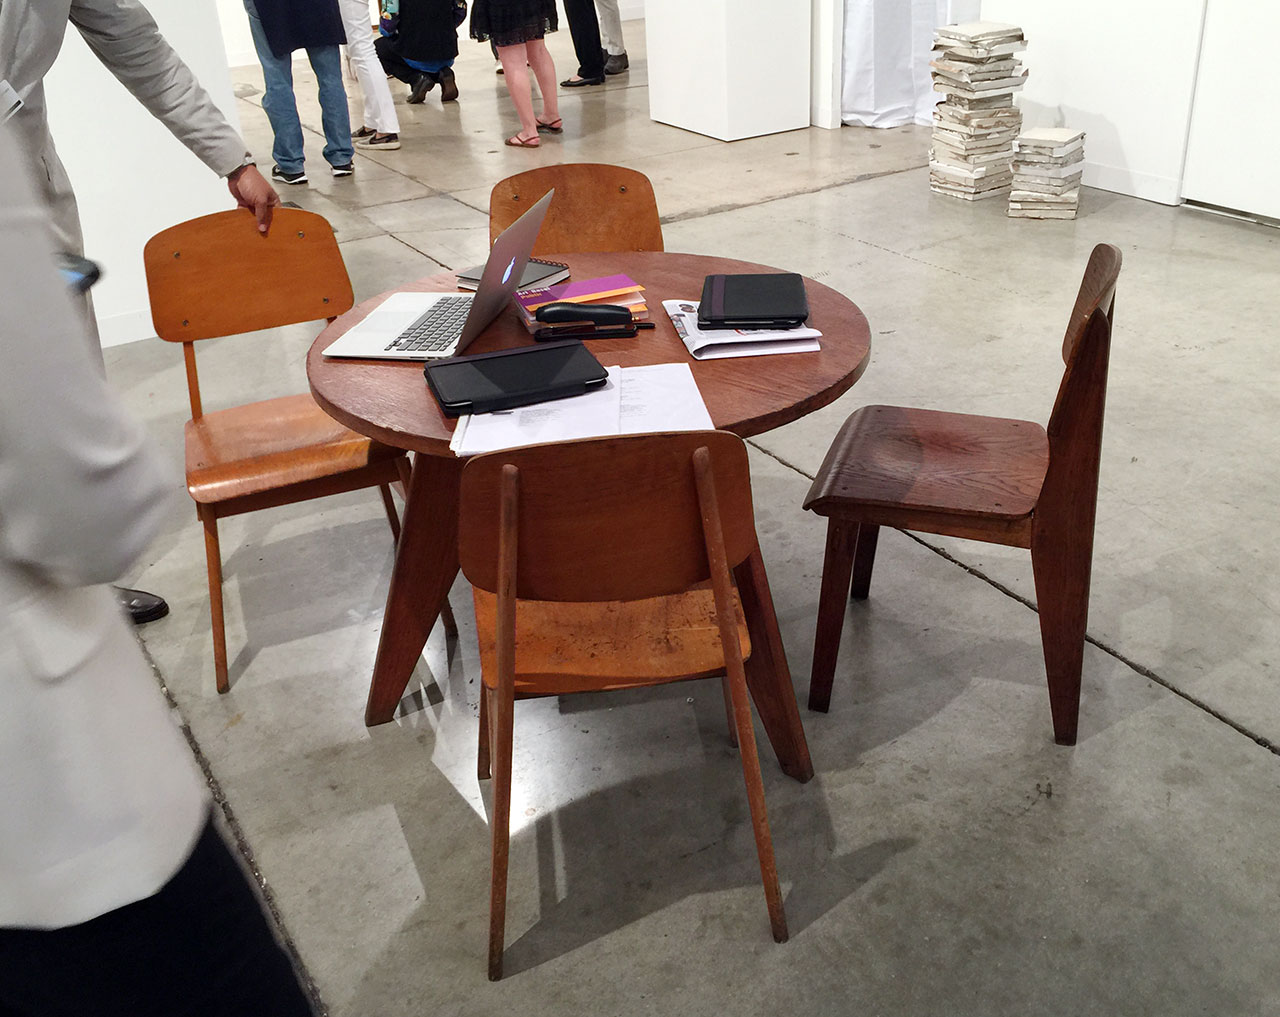 A Paula Cooper gallery of New York